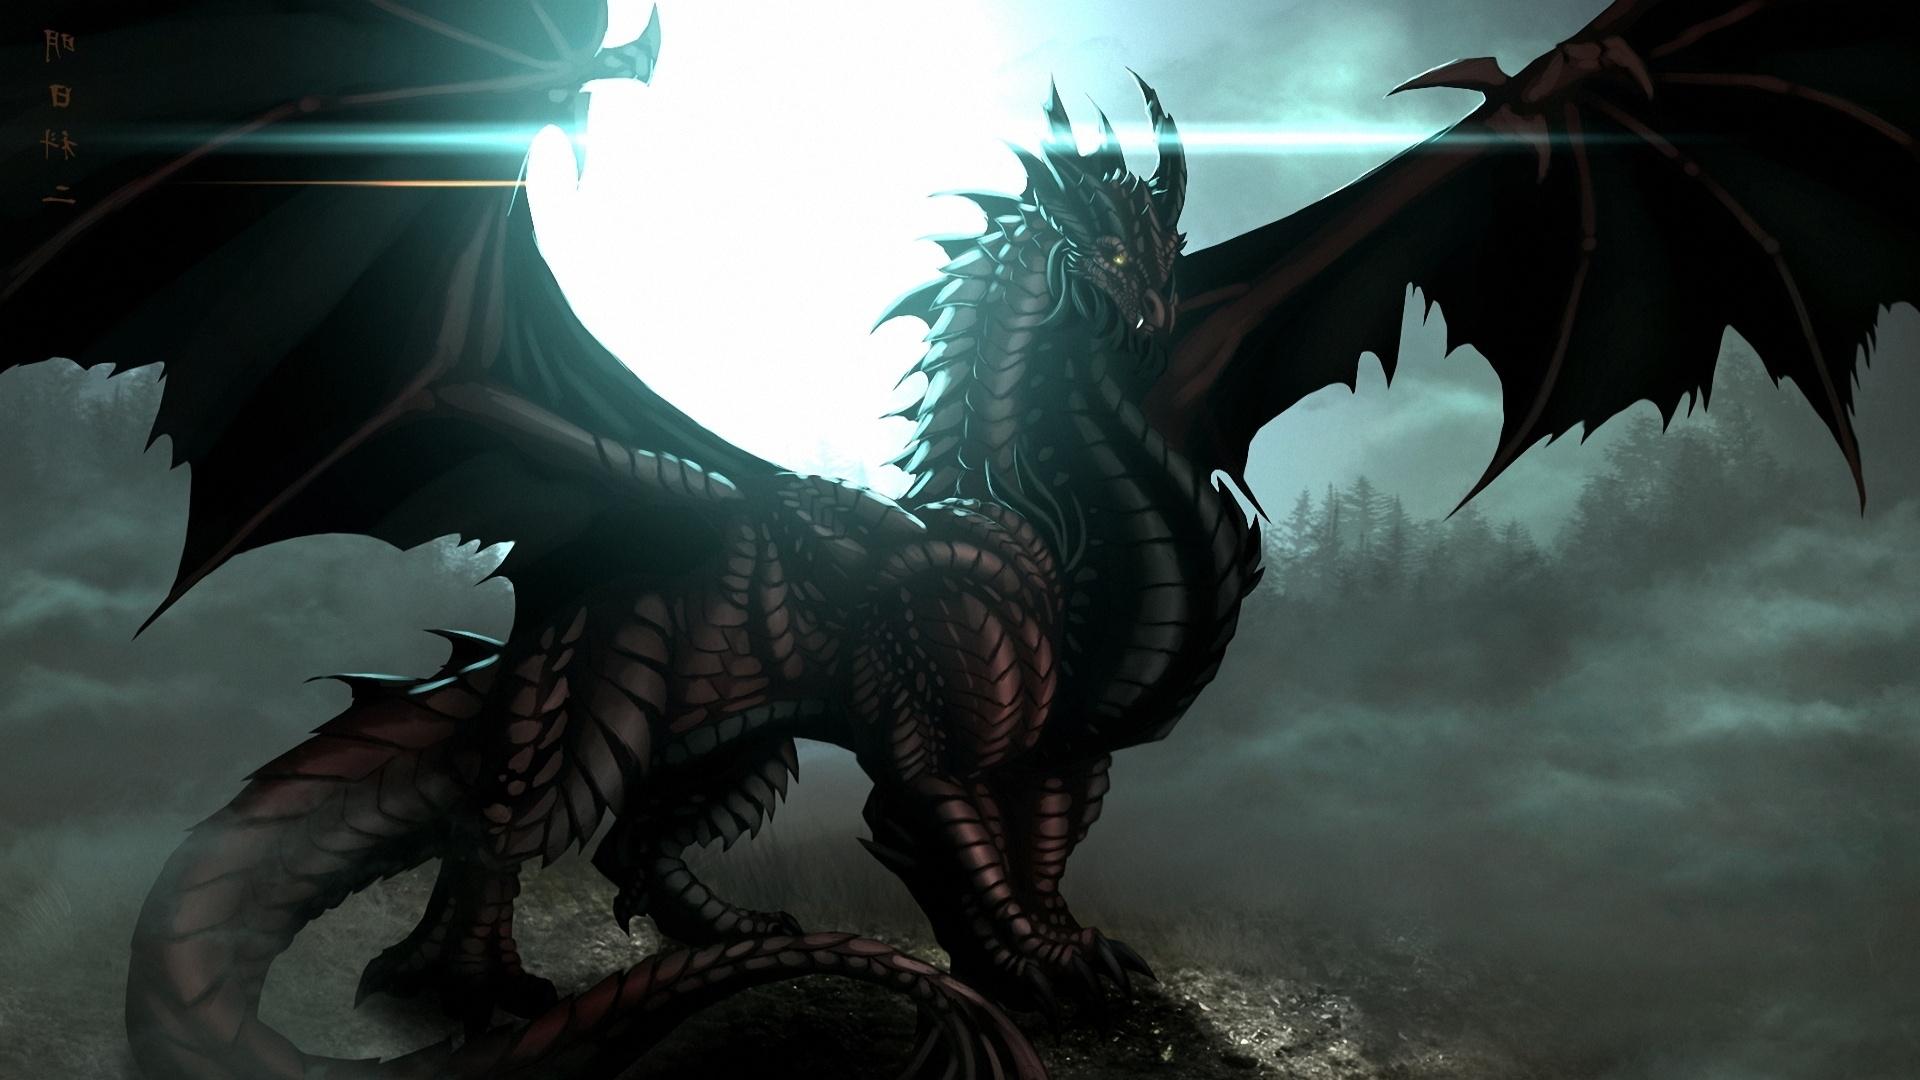 dragon wallpaper hd HD 1920x1080